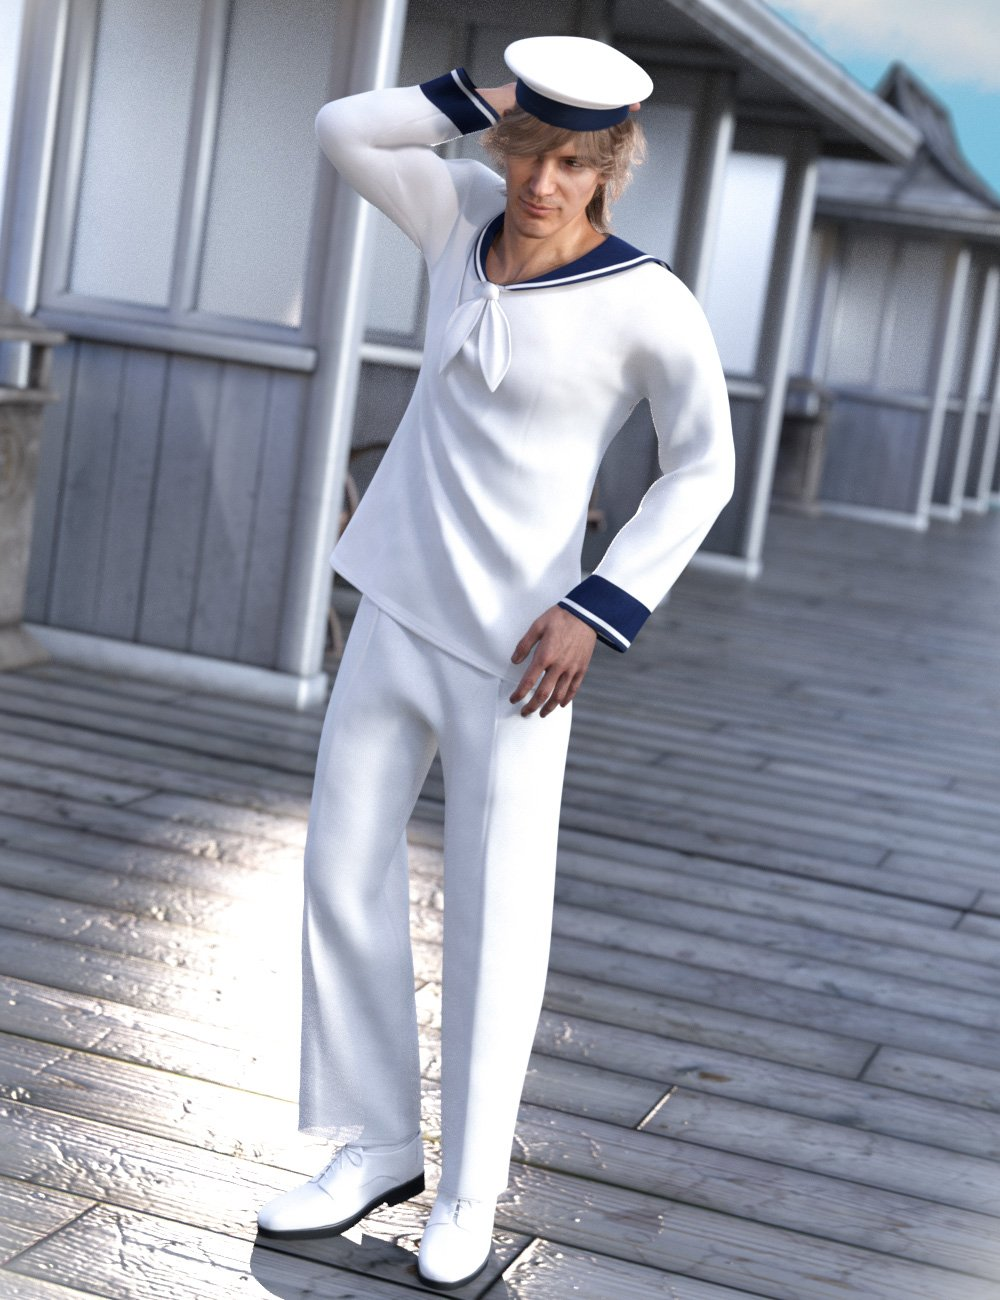 dForce Sailorman Outfit for Genesis 8 Males by: tentman, 3D Models by Daz 3D